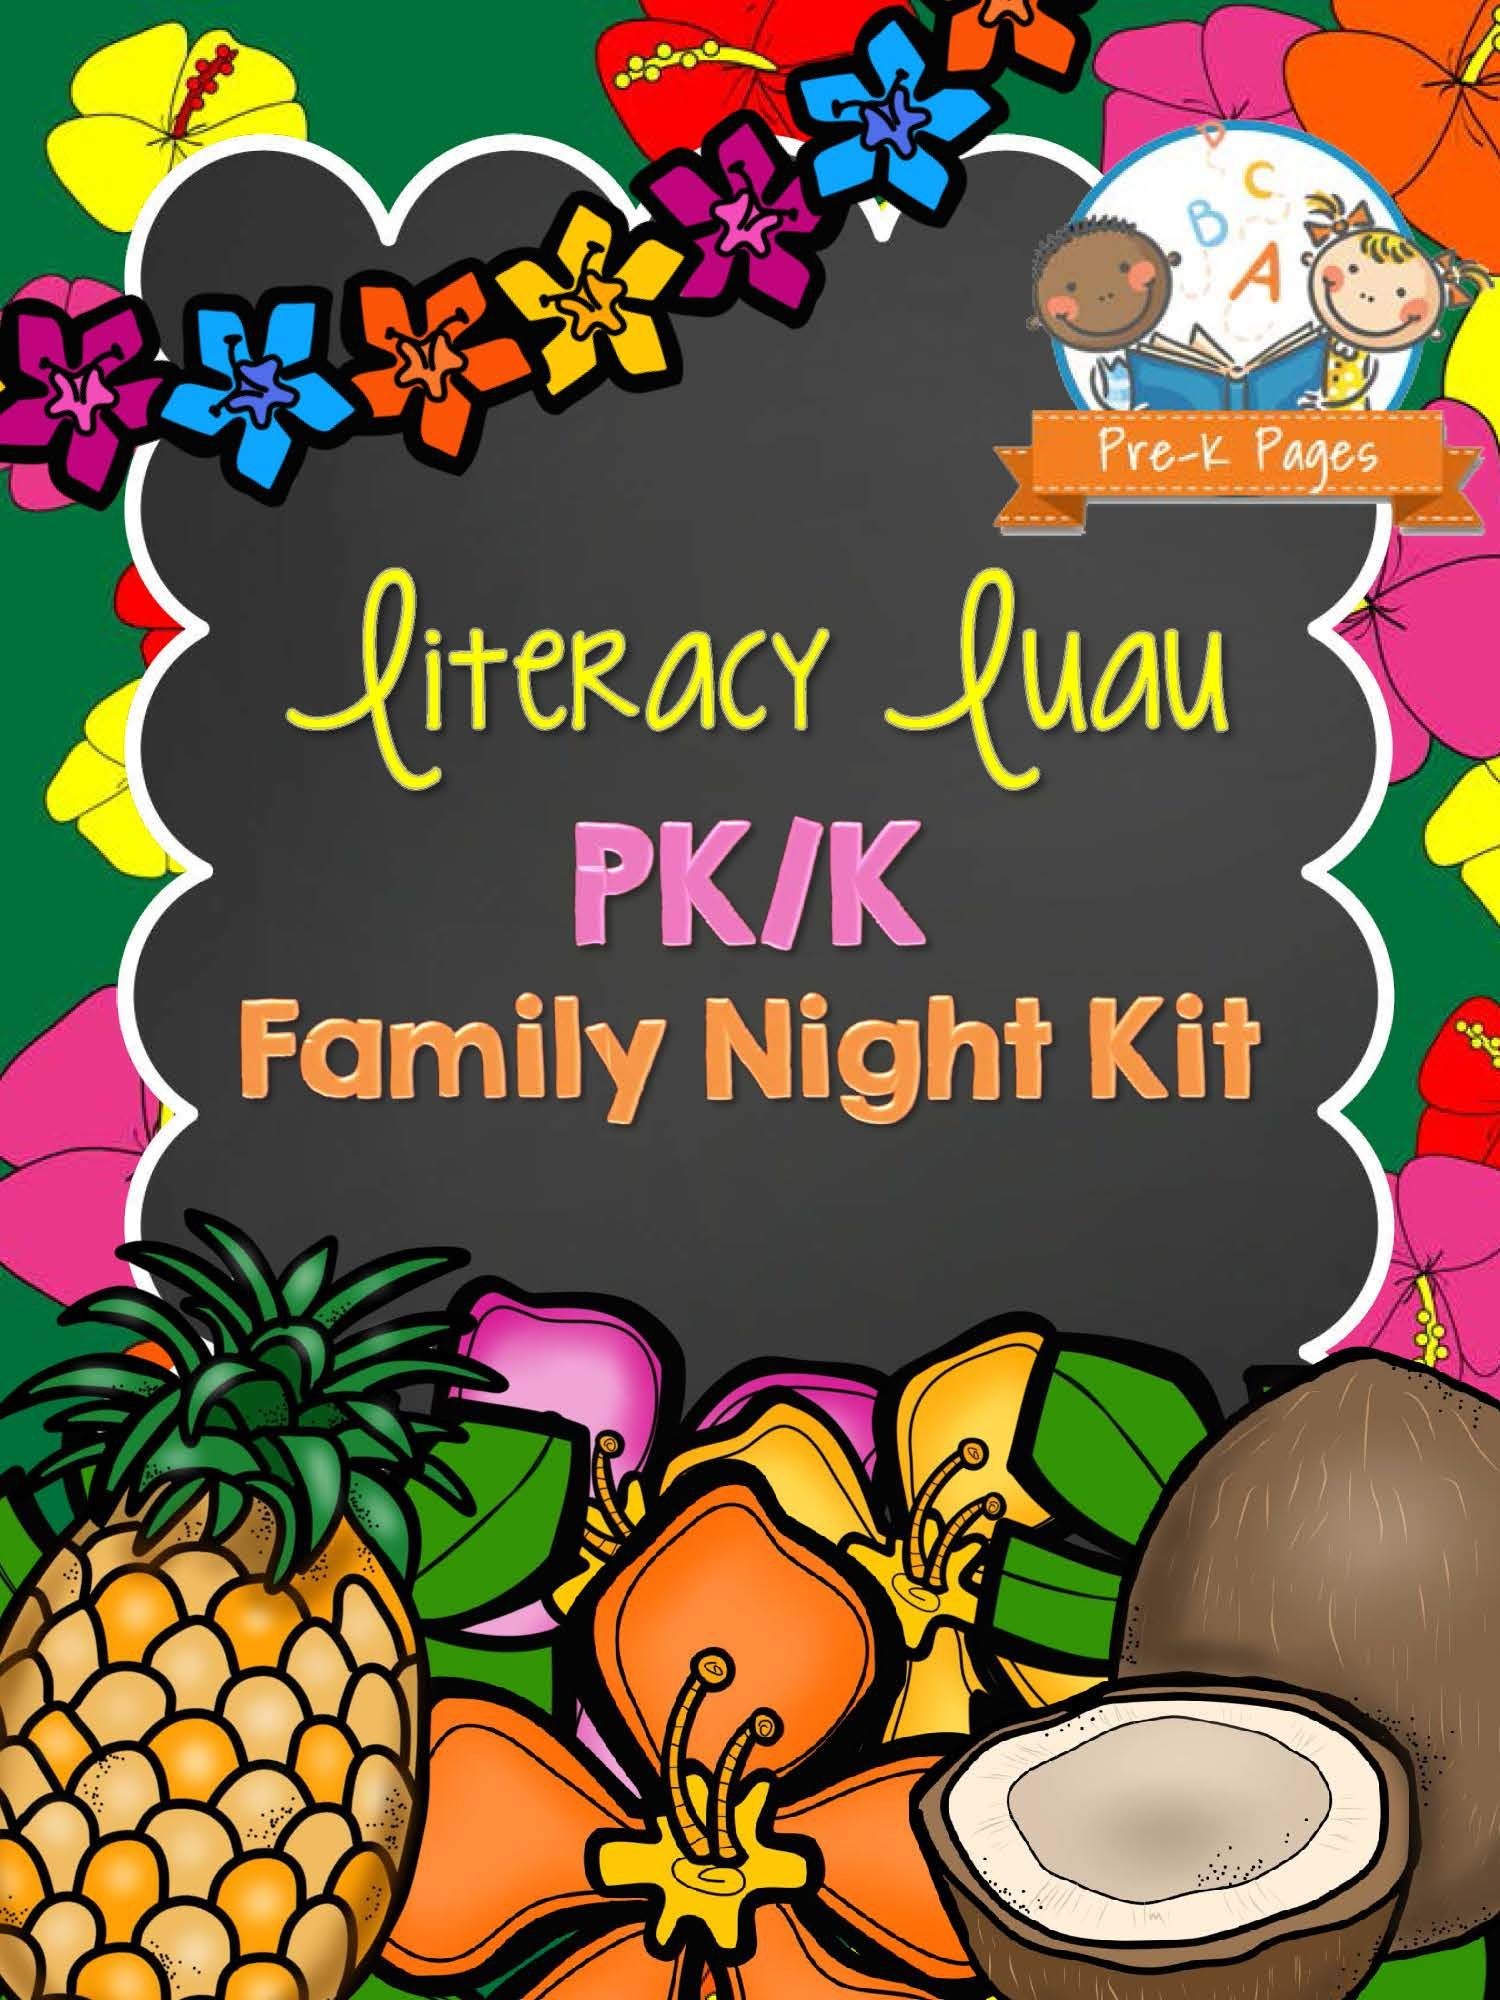 Luau clipart literacy. Family night kit preschool